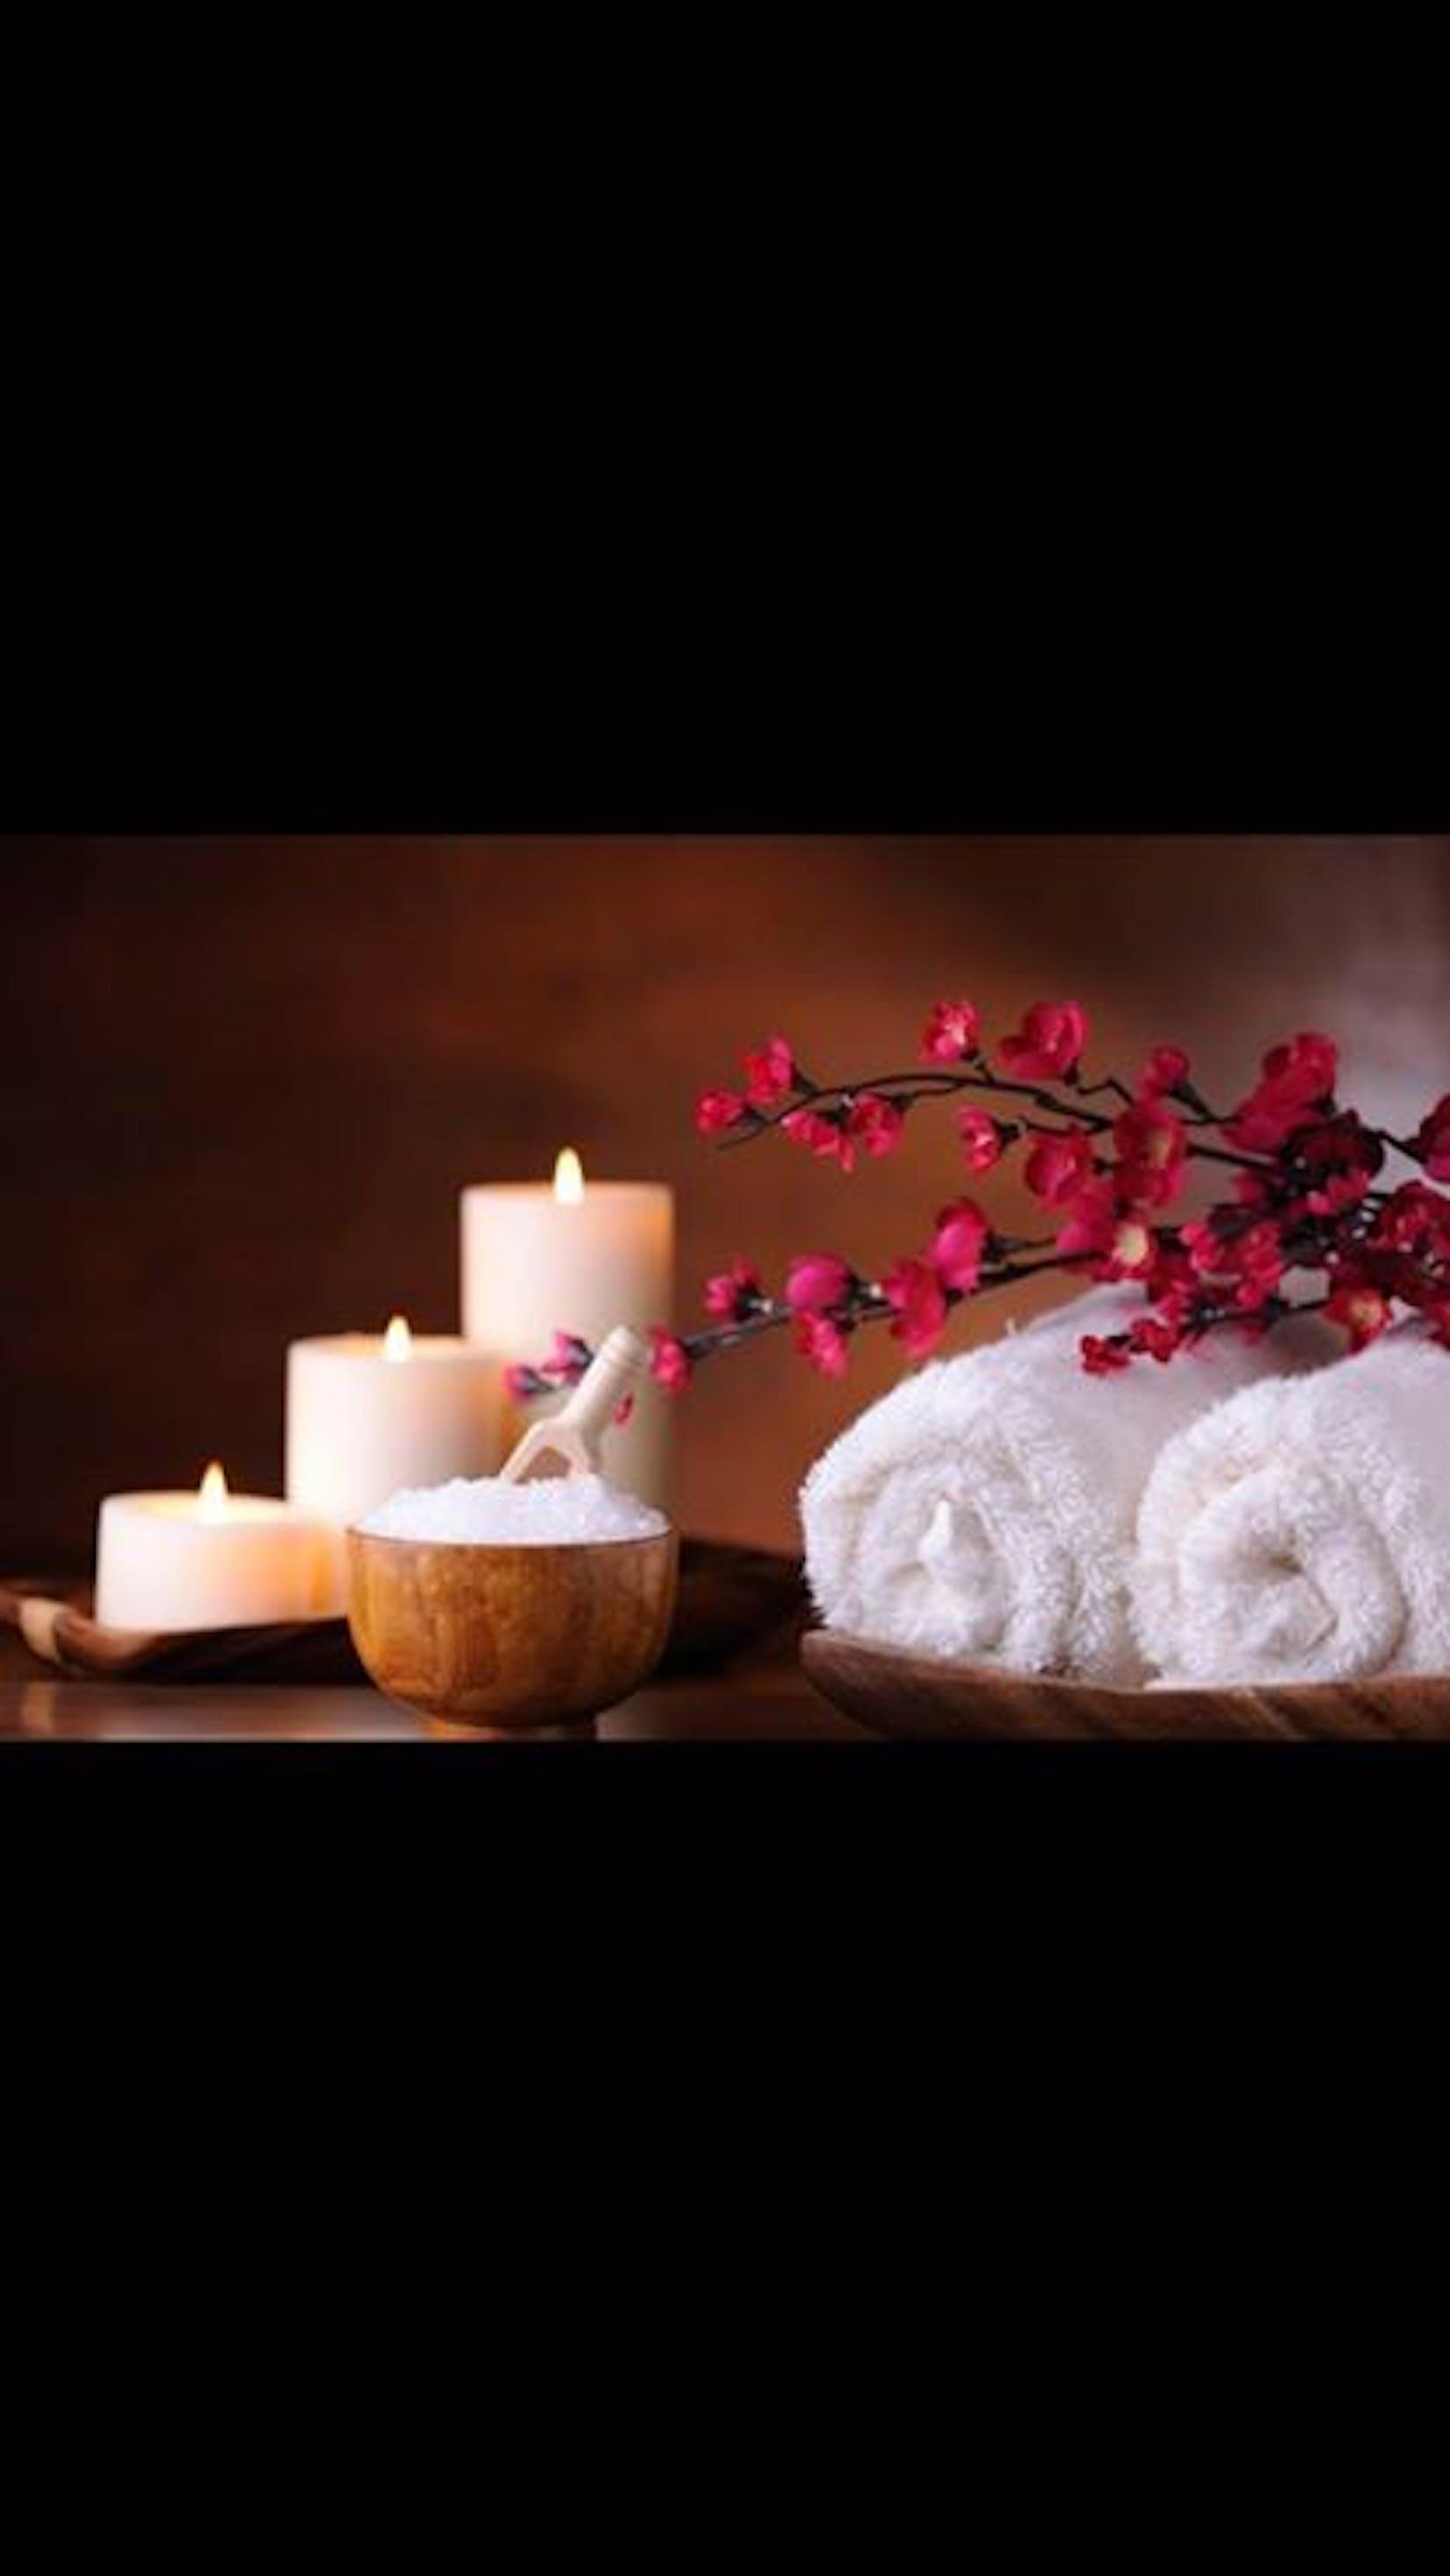 One Star Health & Beauty Reflexology | Beauty